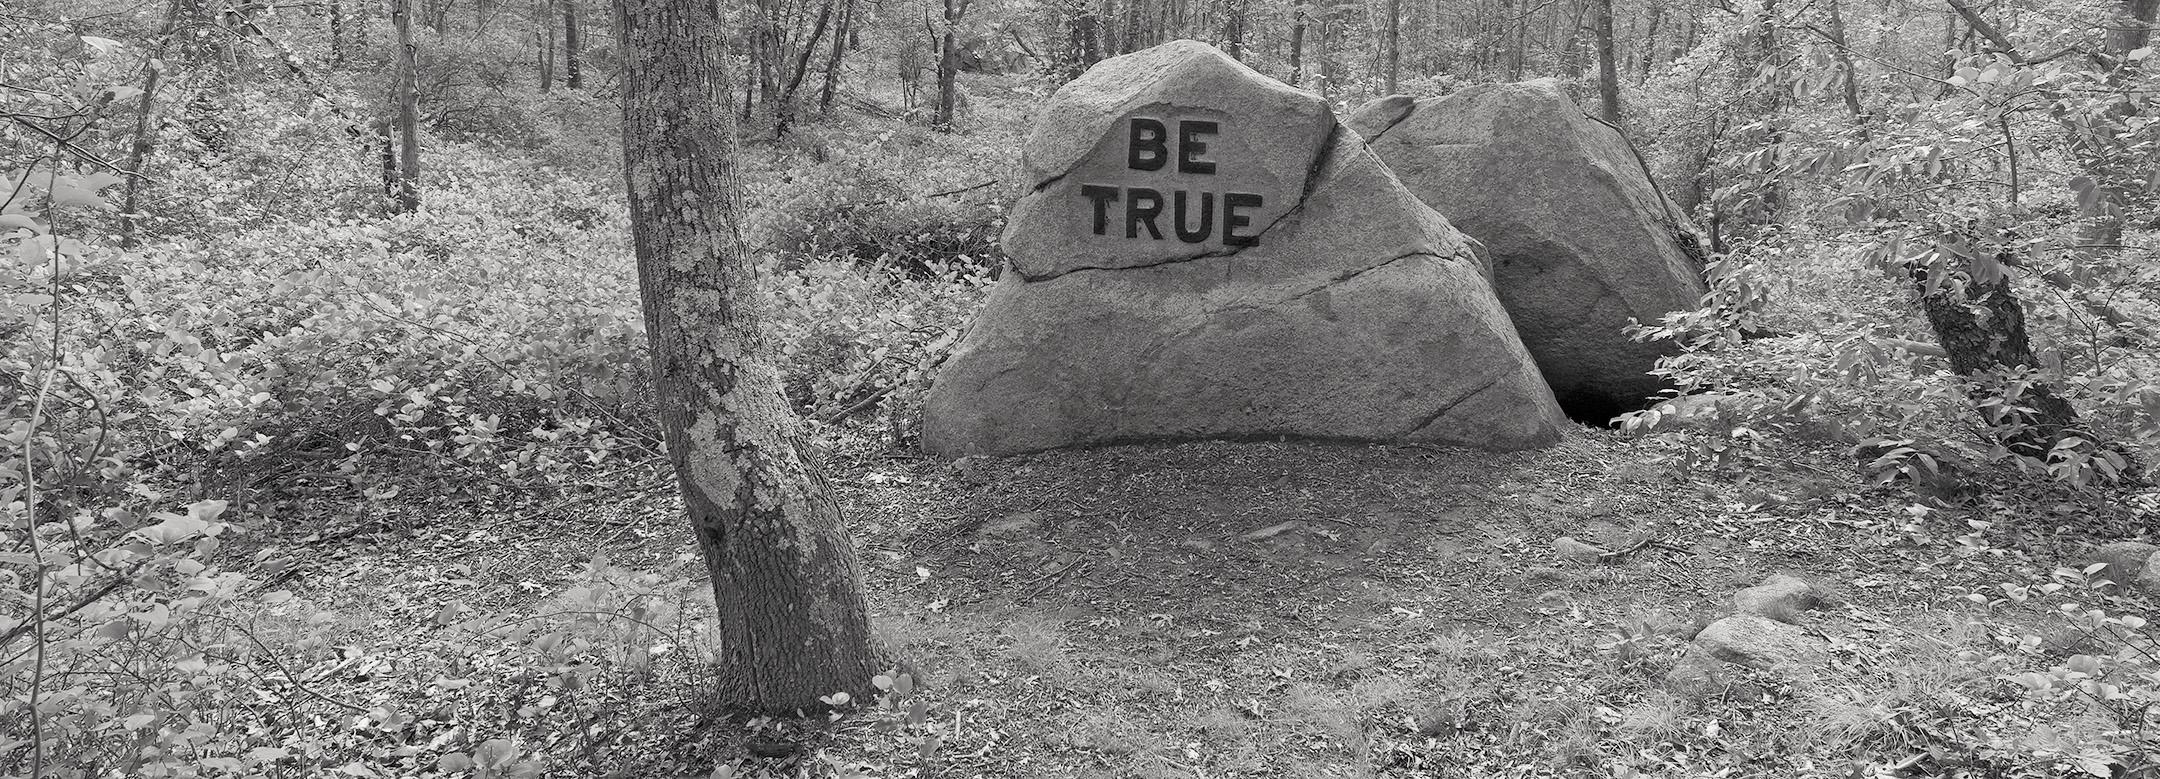 Ted Hendrickson, Dogtown Be True